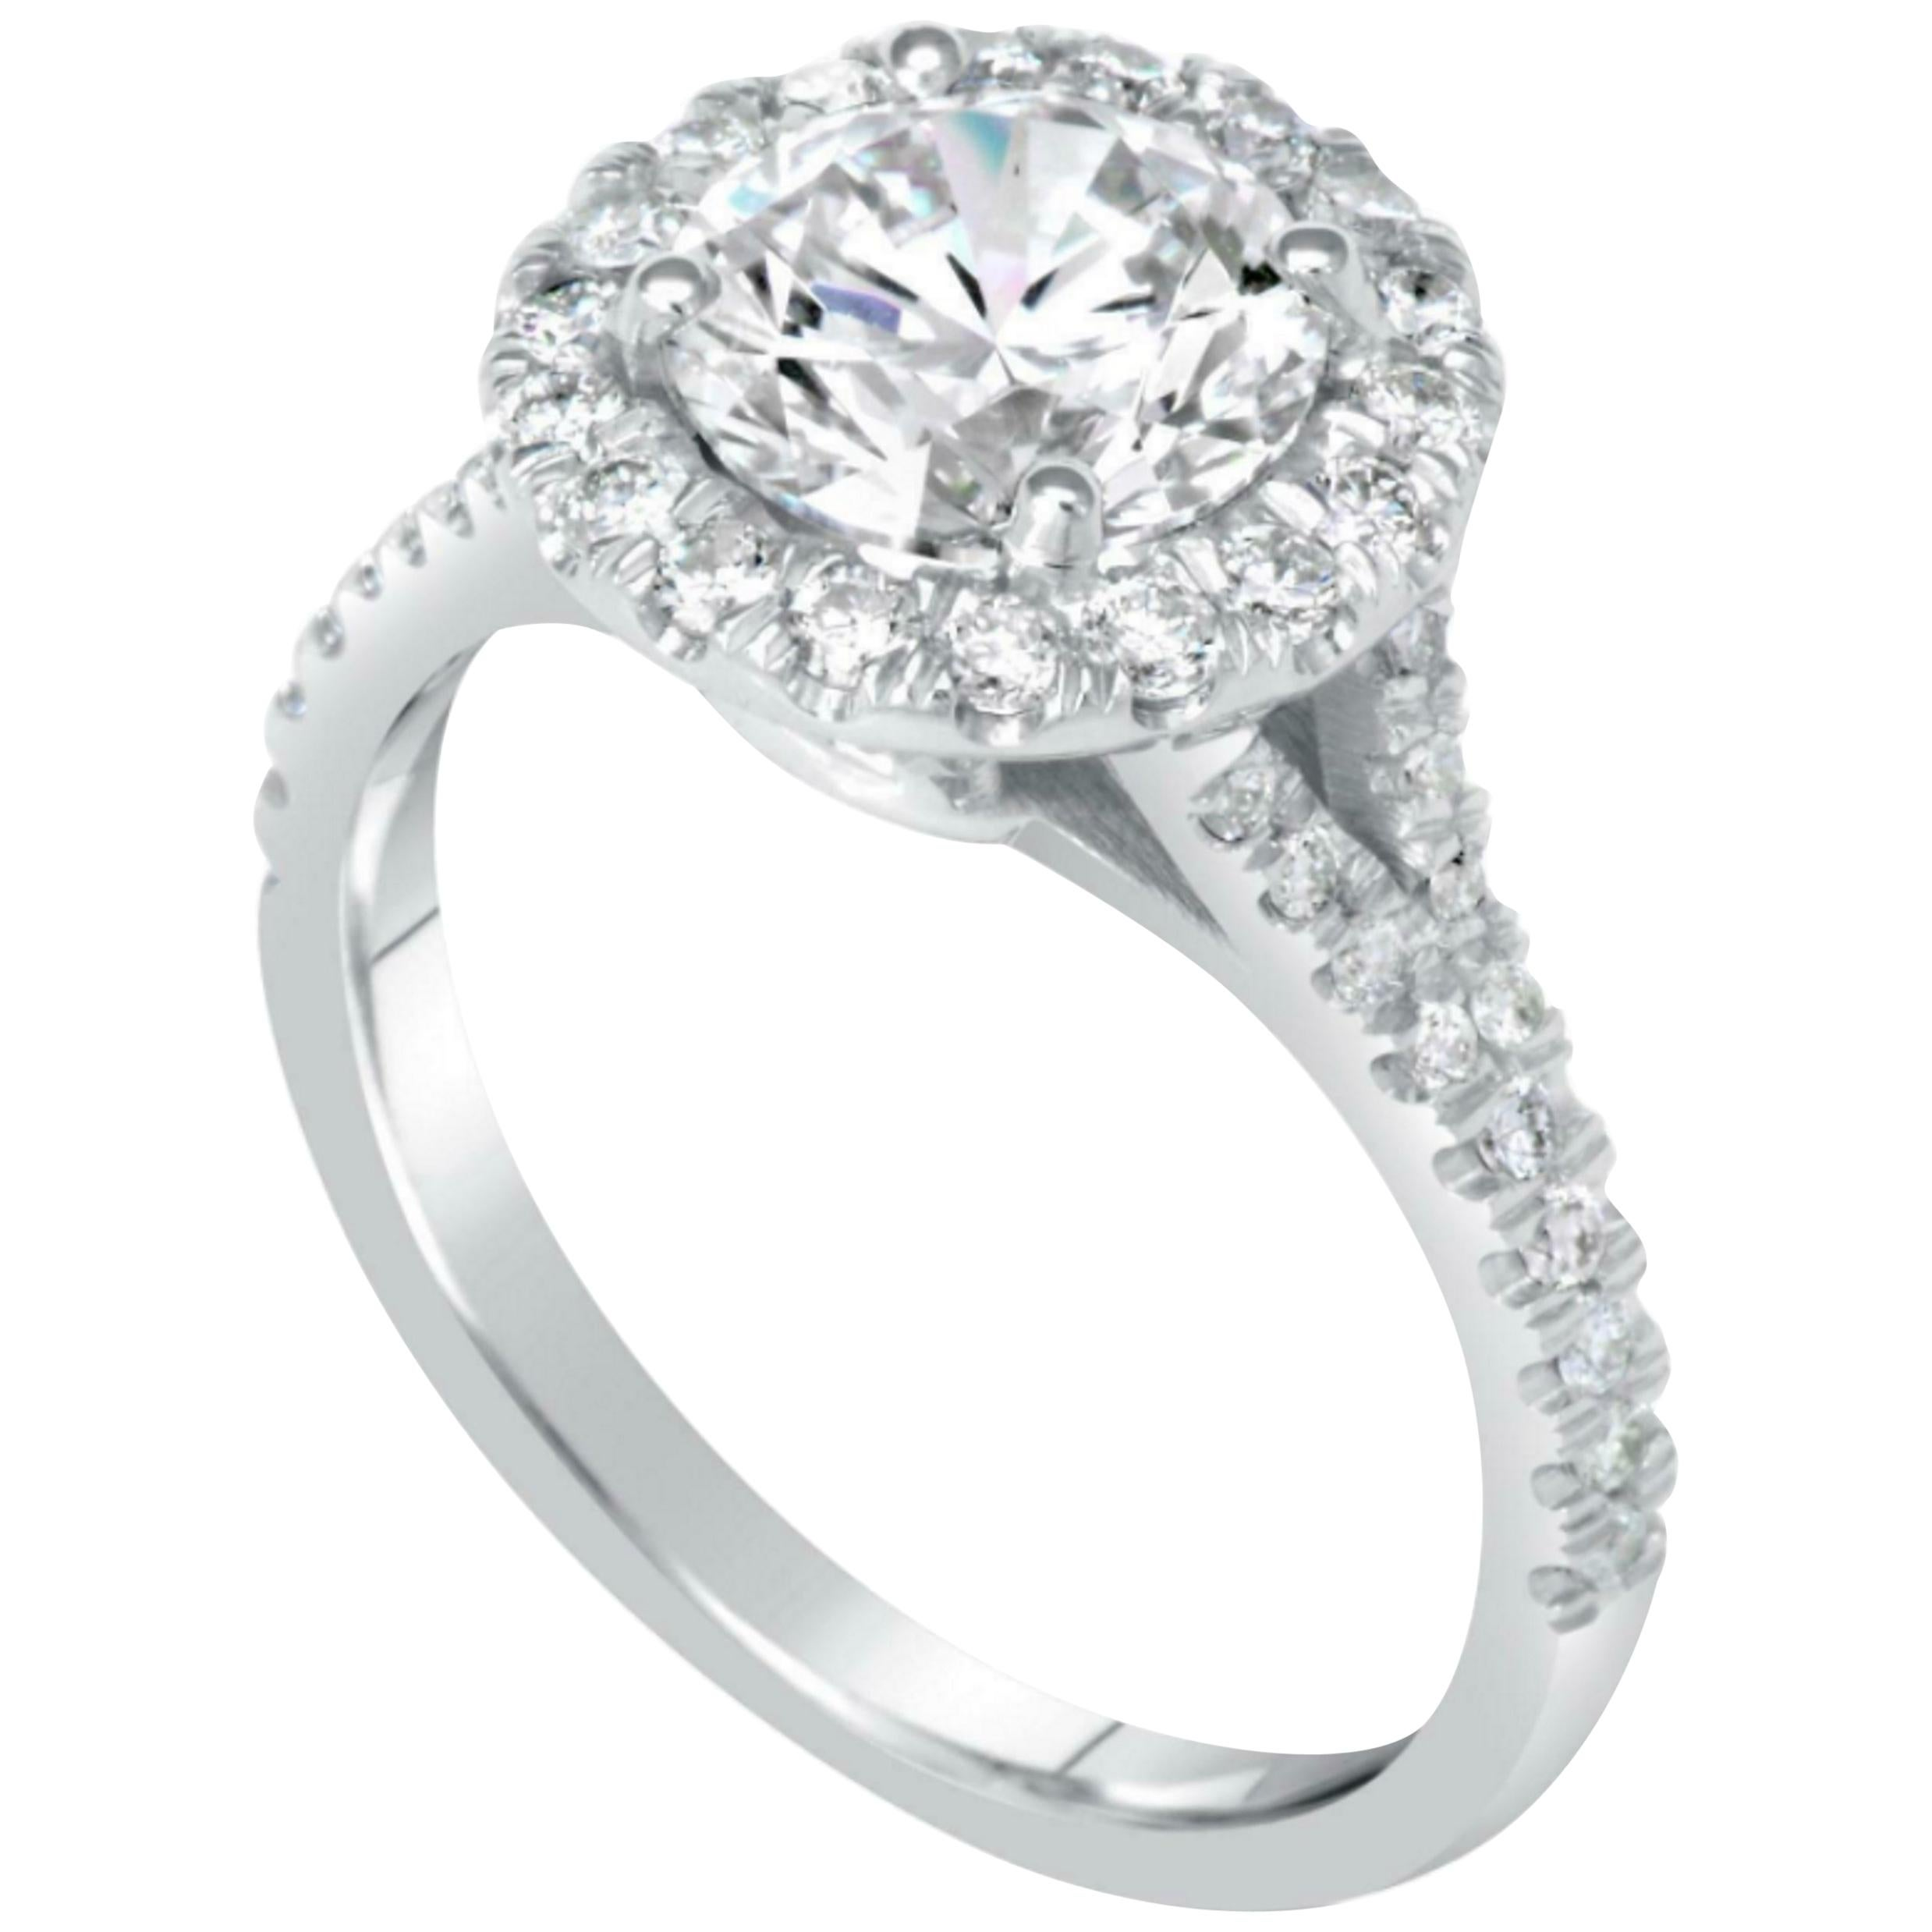 GIA Certified 2.60 Carat Triple Excellent Cut Diamond Platinum Ring